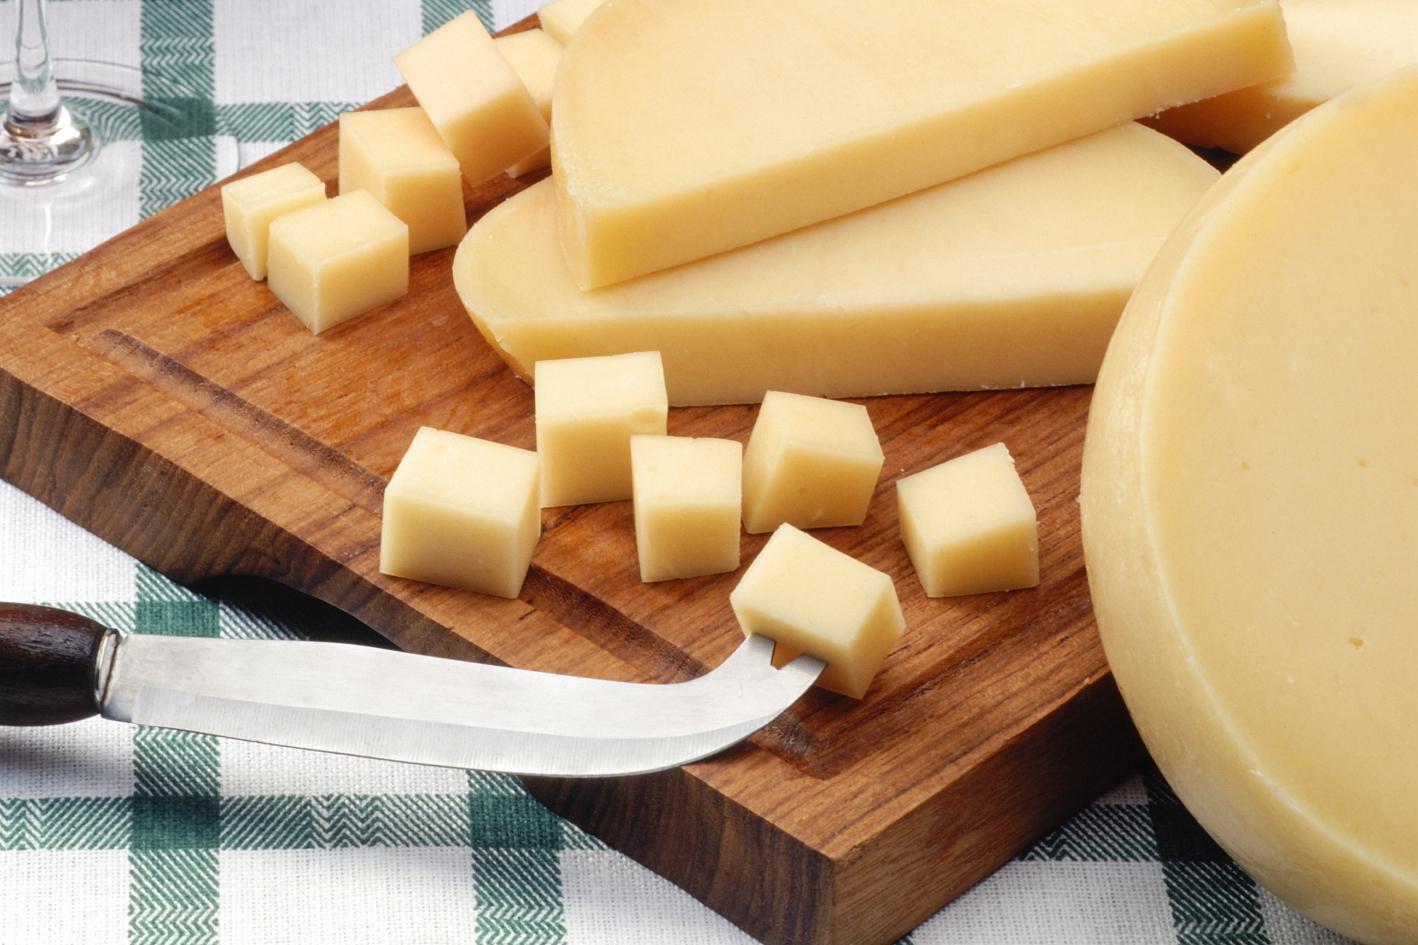 provolone cheese taste